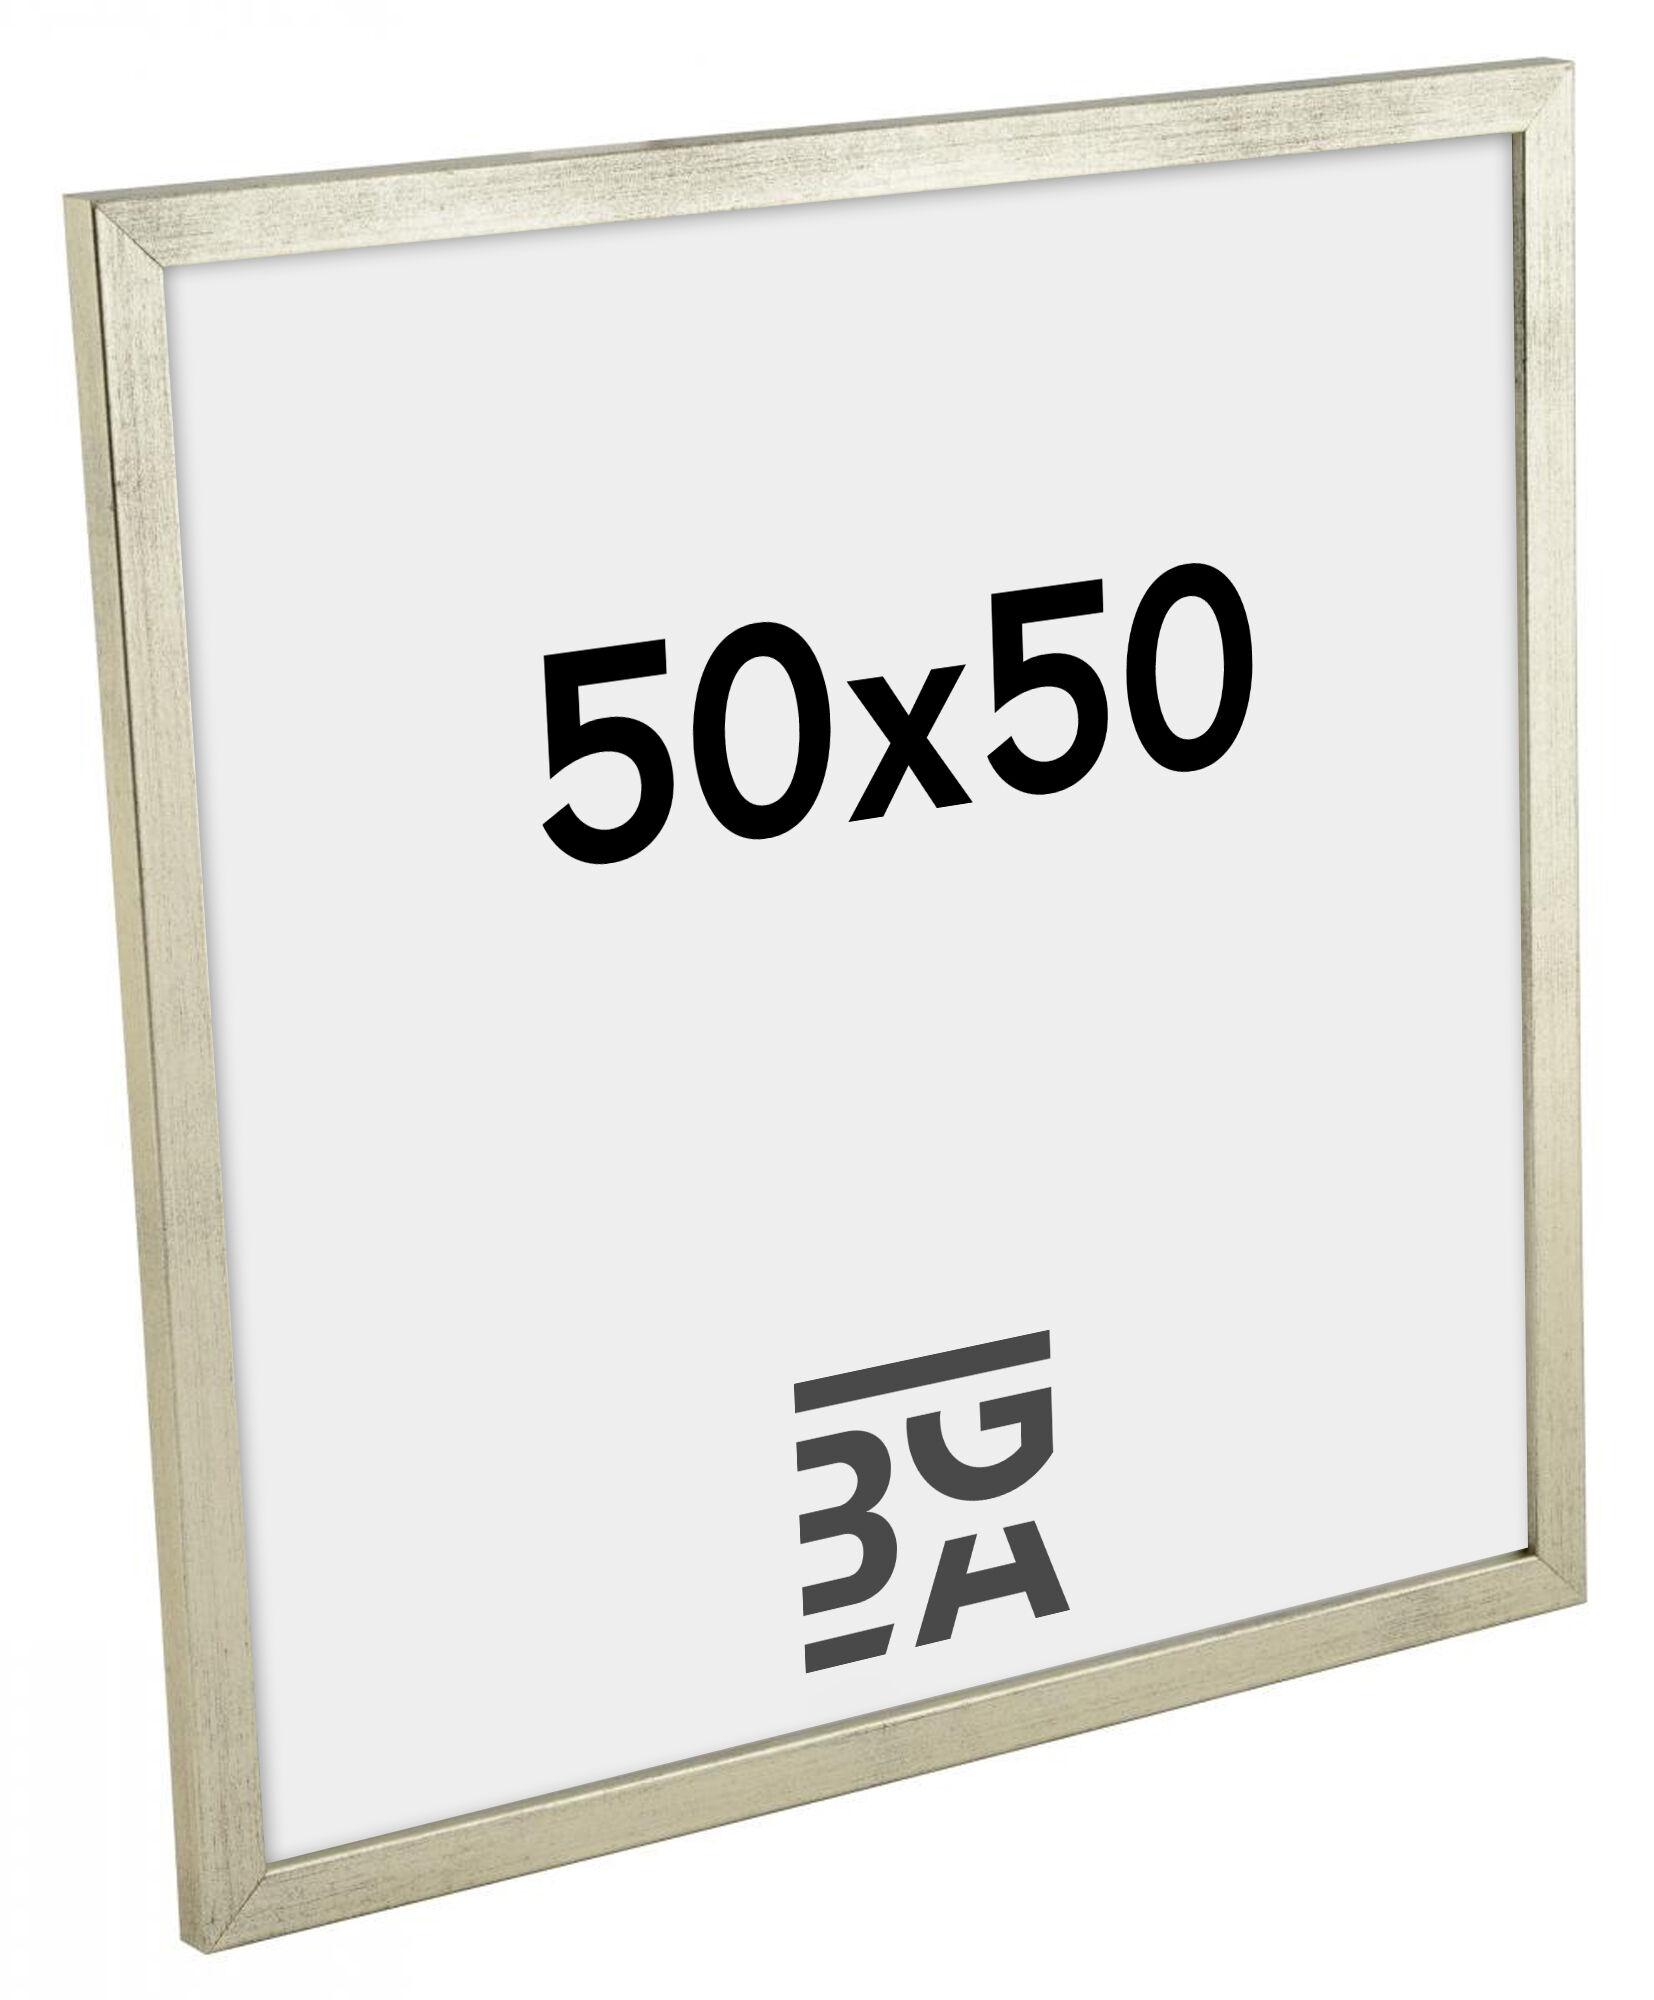 Estancia Galant Hopeanvärinen 50x50 cm